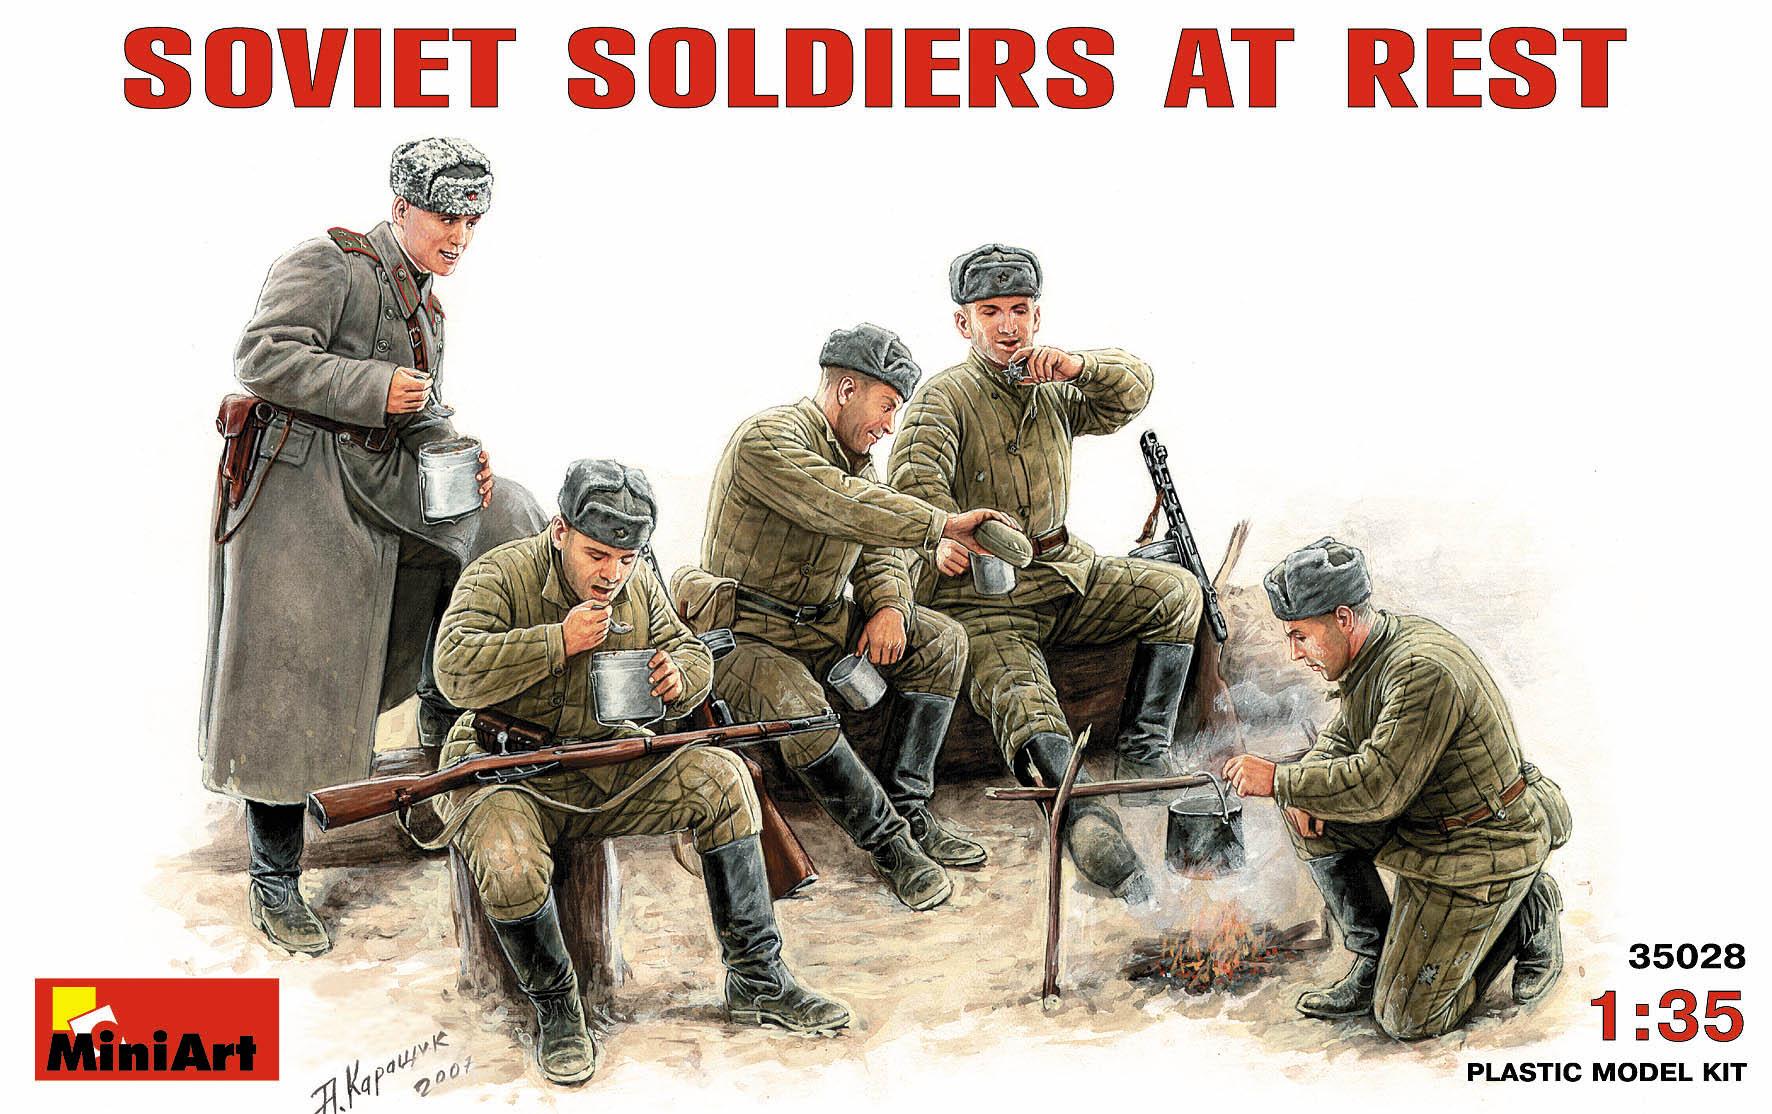 SOVIET SOLDIERS AT REST